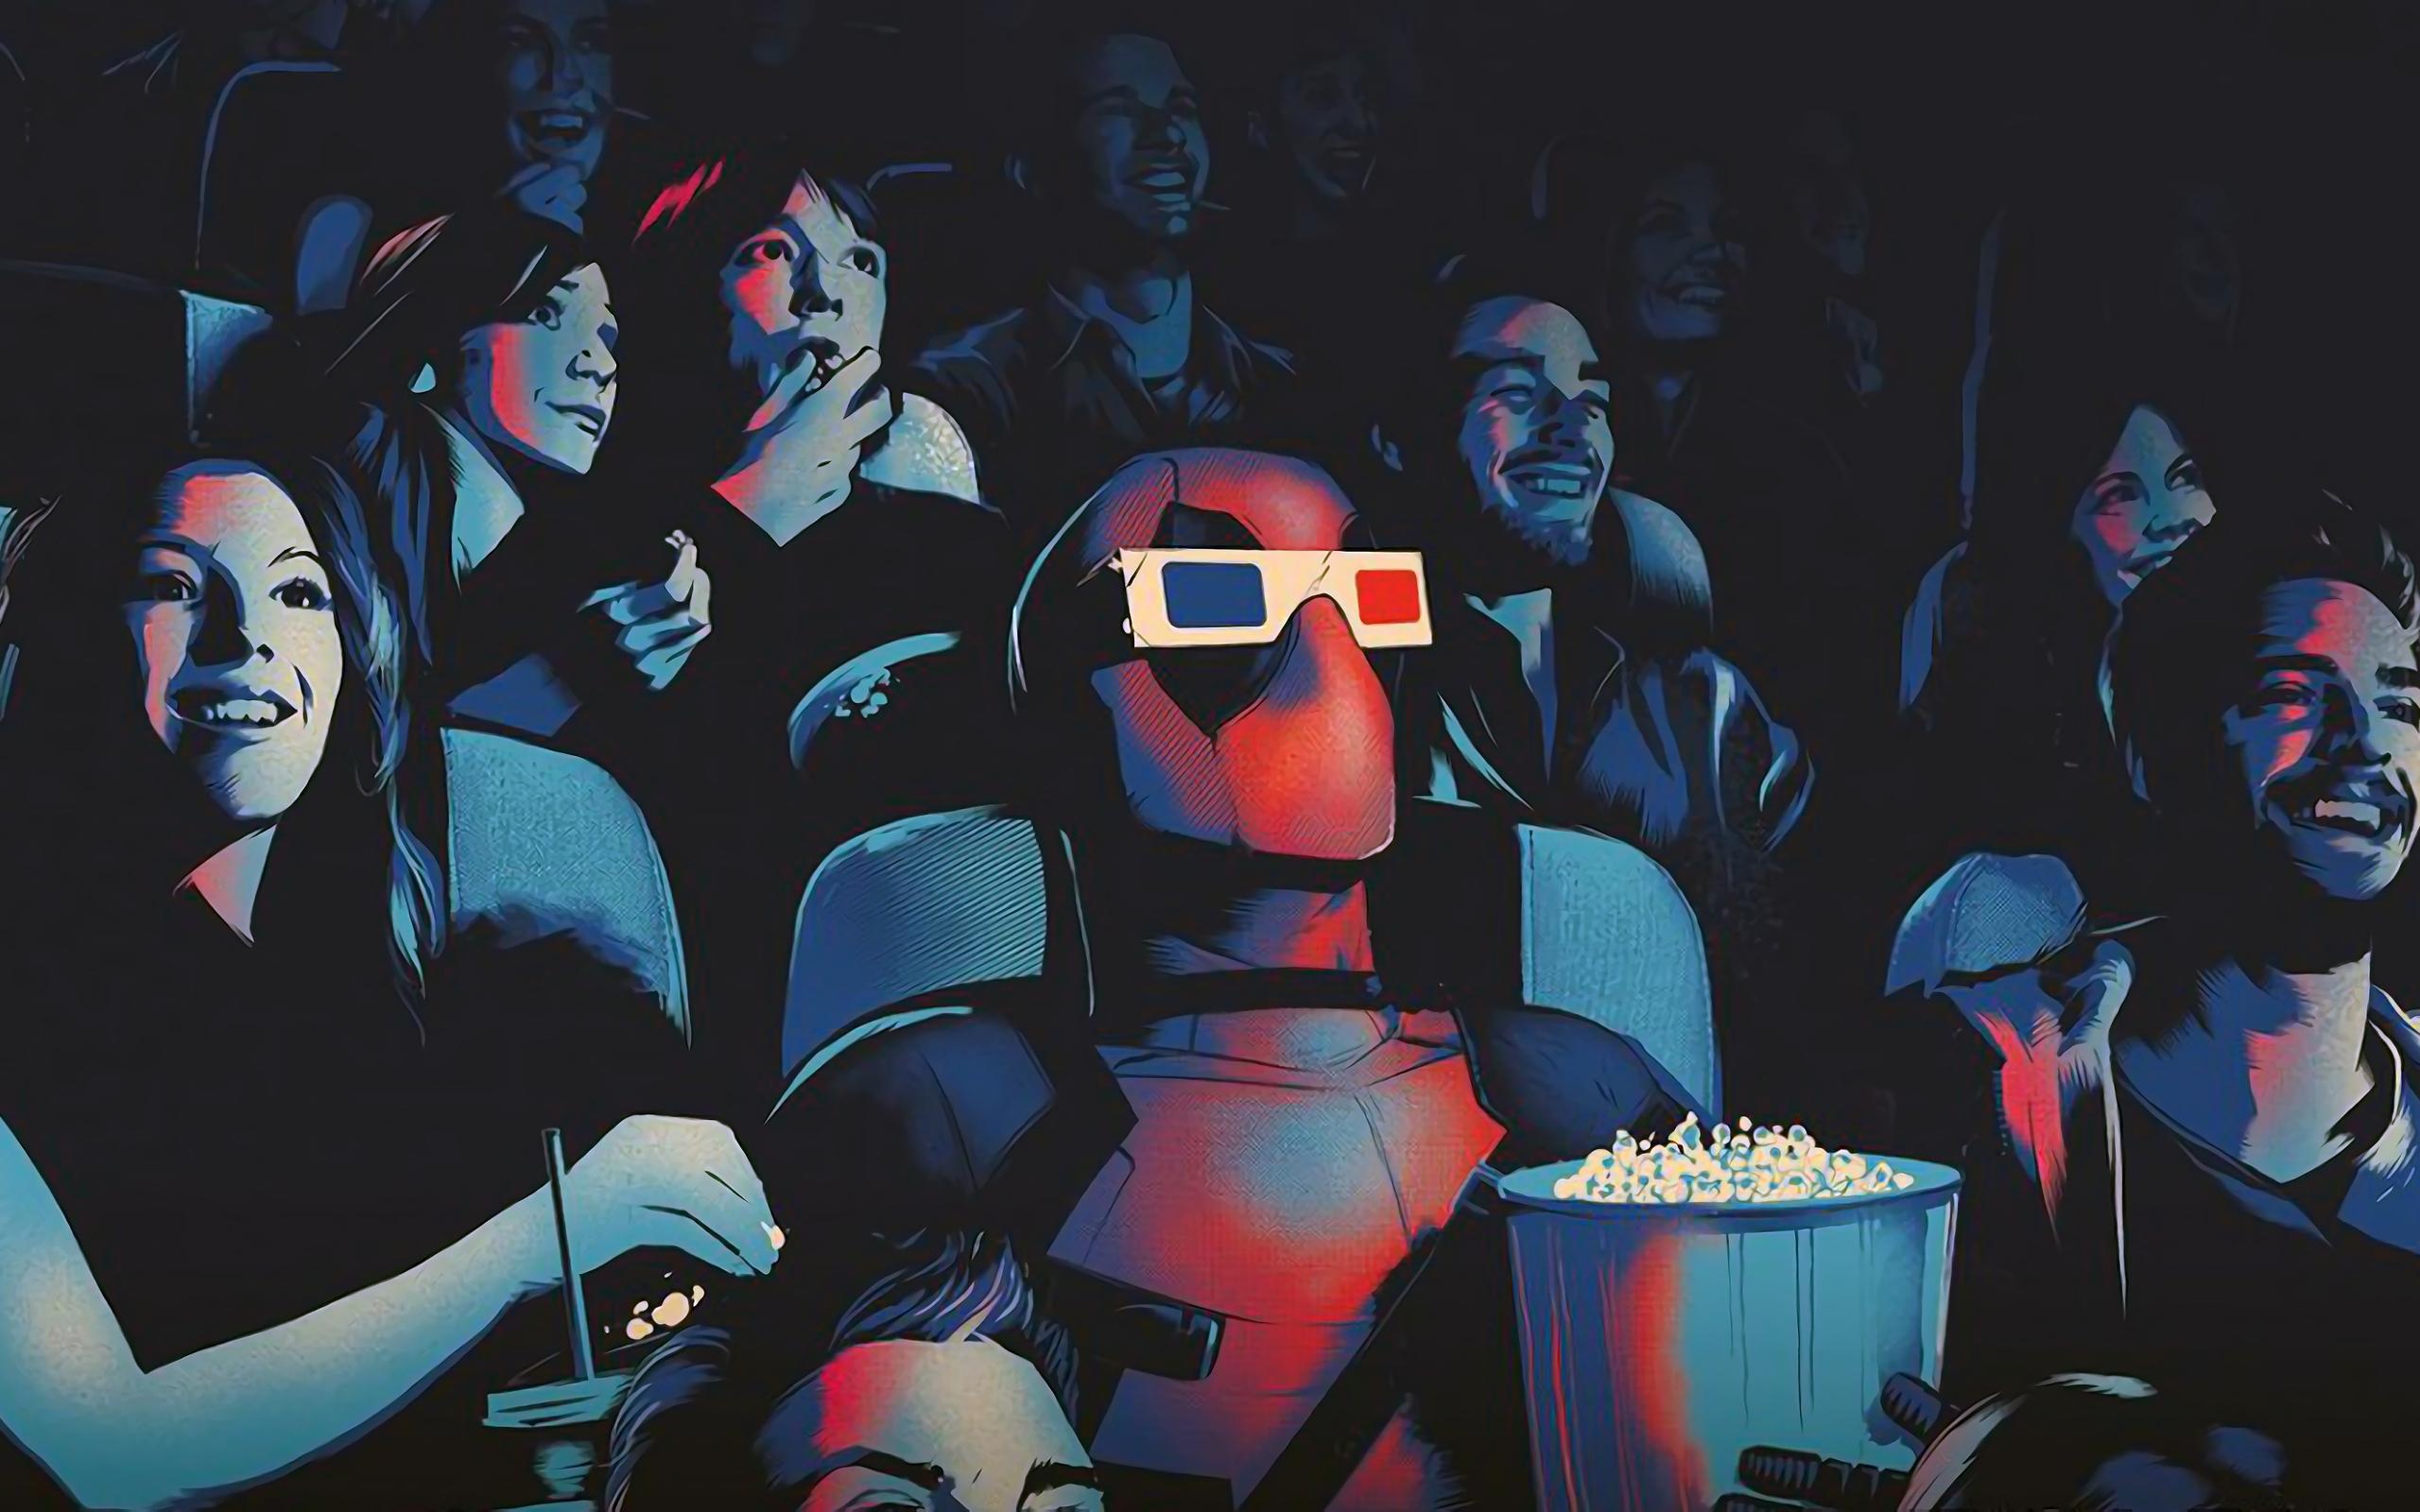 2560x1600 Deadpool 2 Movie Cinema 2560x1600 Resolution Hd 4k